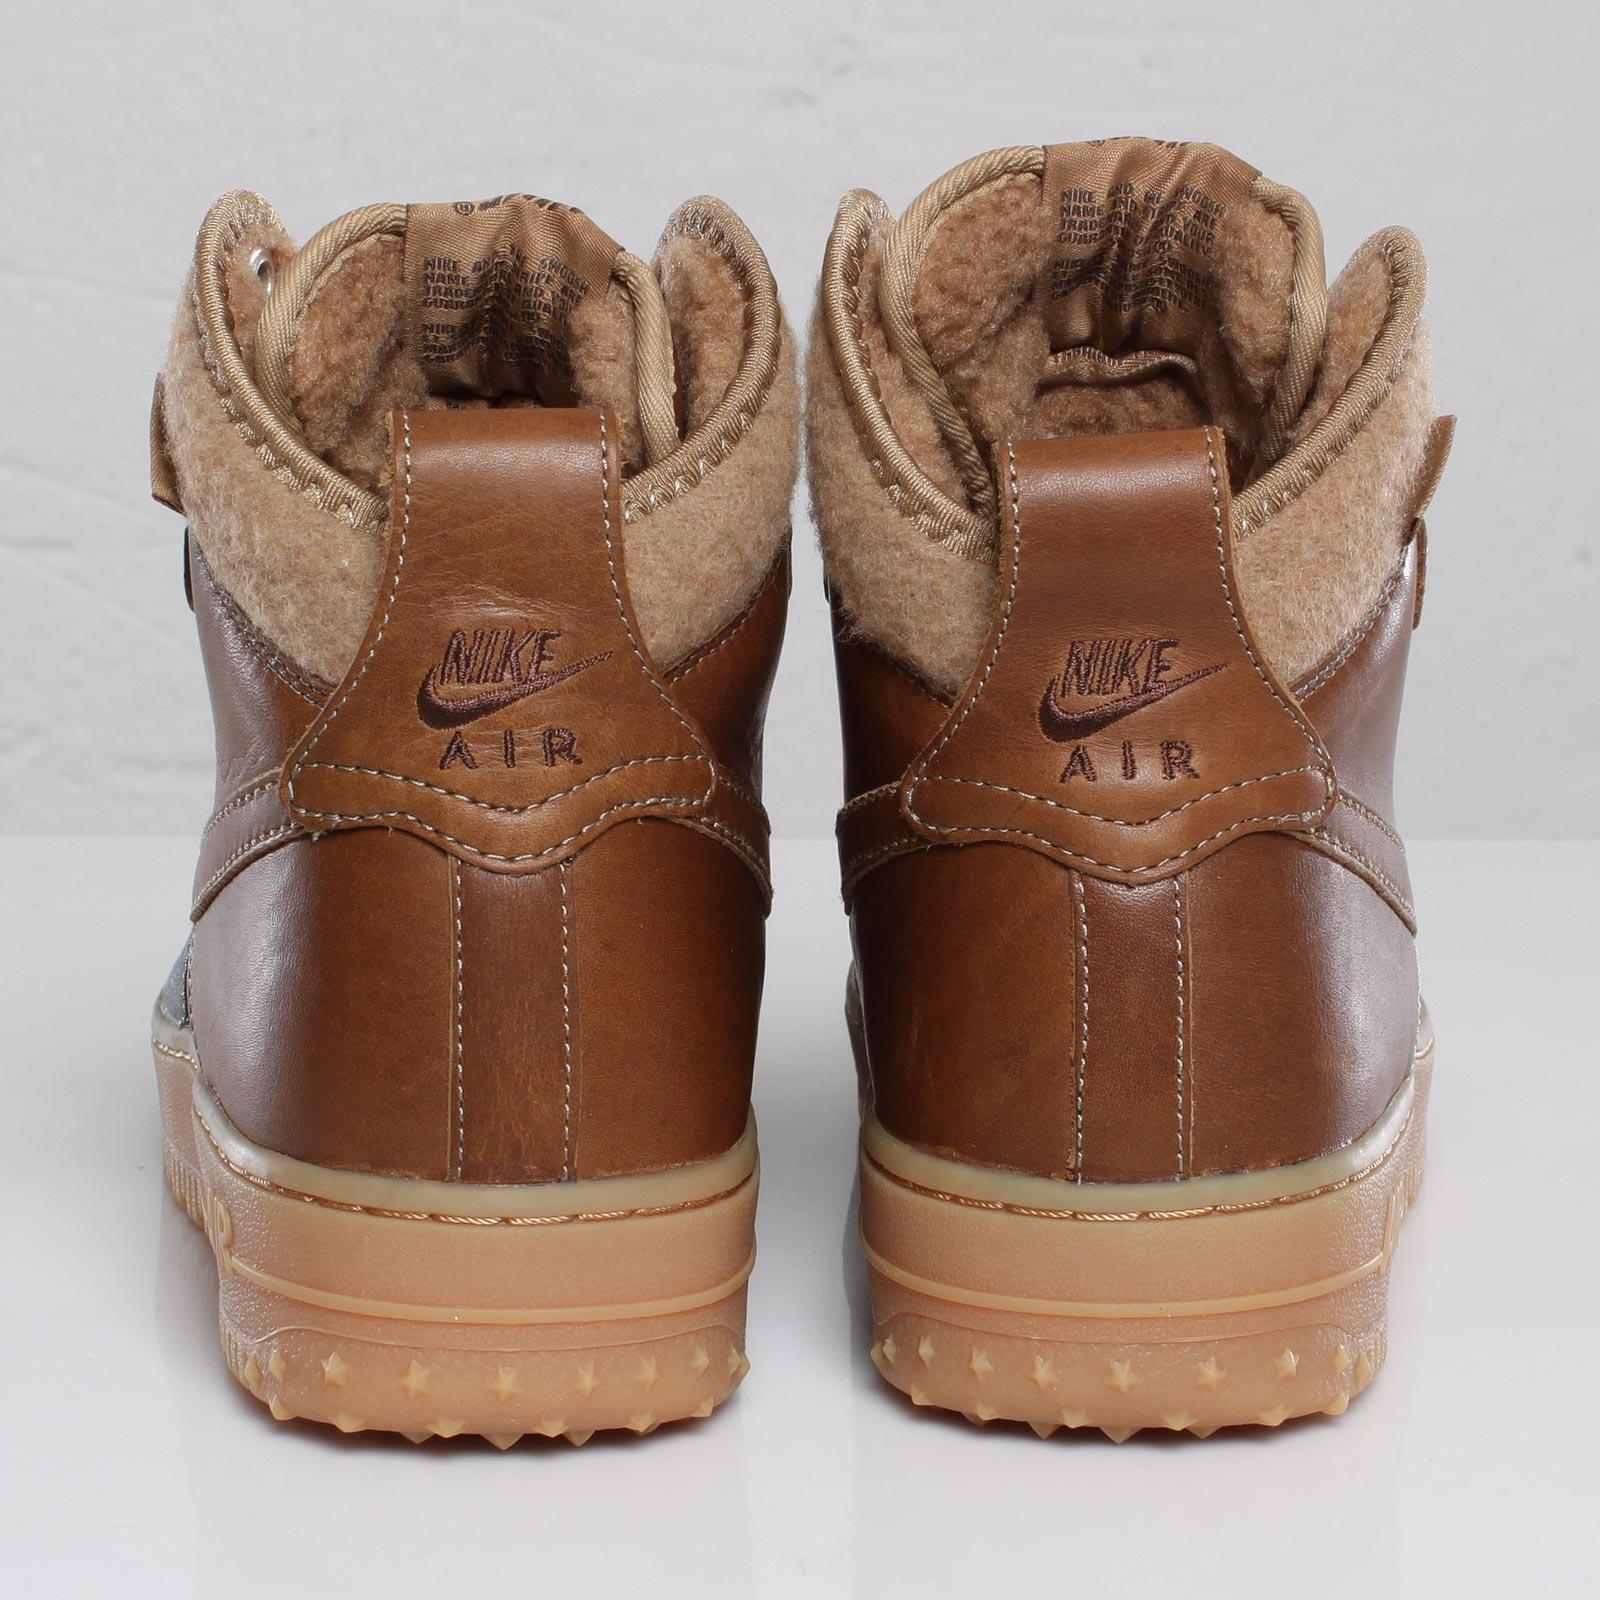 promo code 94539 920b4 Nike Air Force 1 Duckboot - 102634 - Sneakersnstuff   sneakers   streetwear  online since 1999